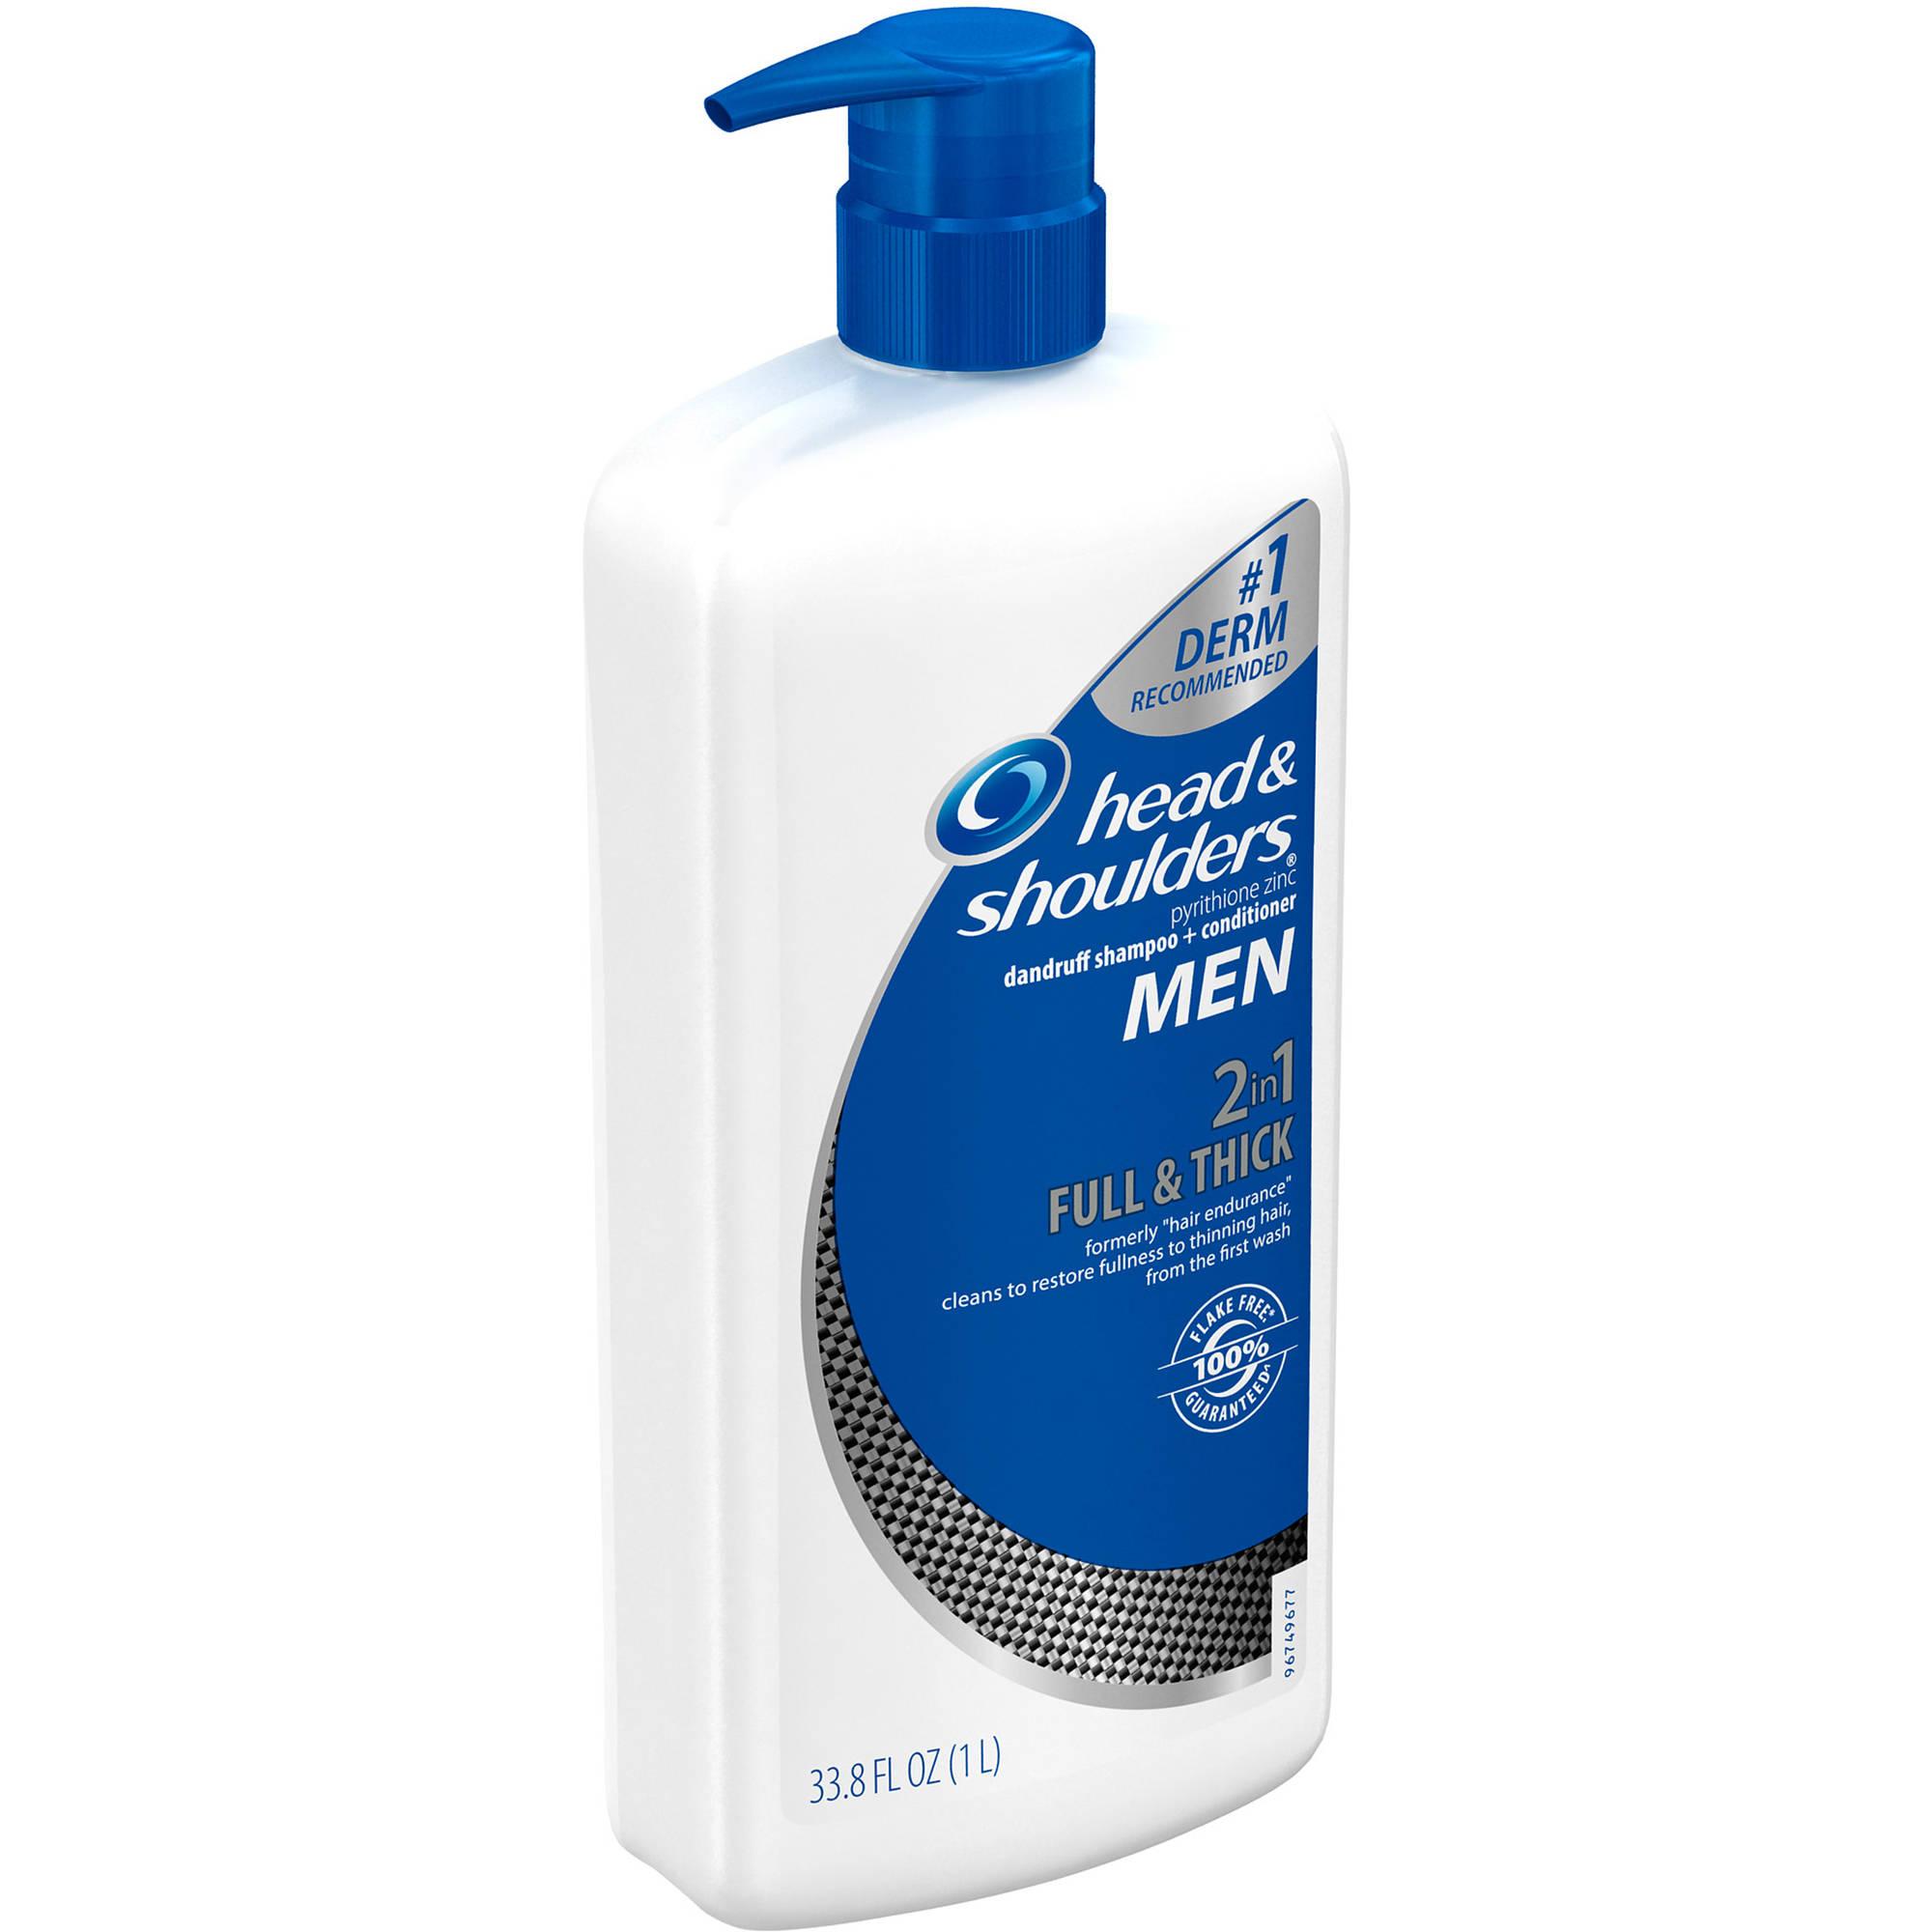 Head Shoulders Men 2in1 Full Thick Dandruff Shampoo